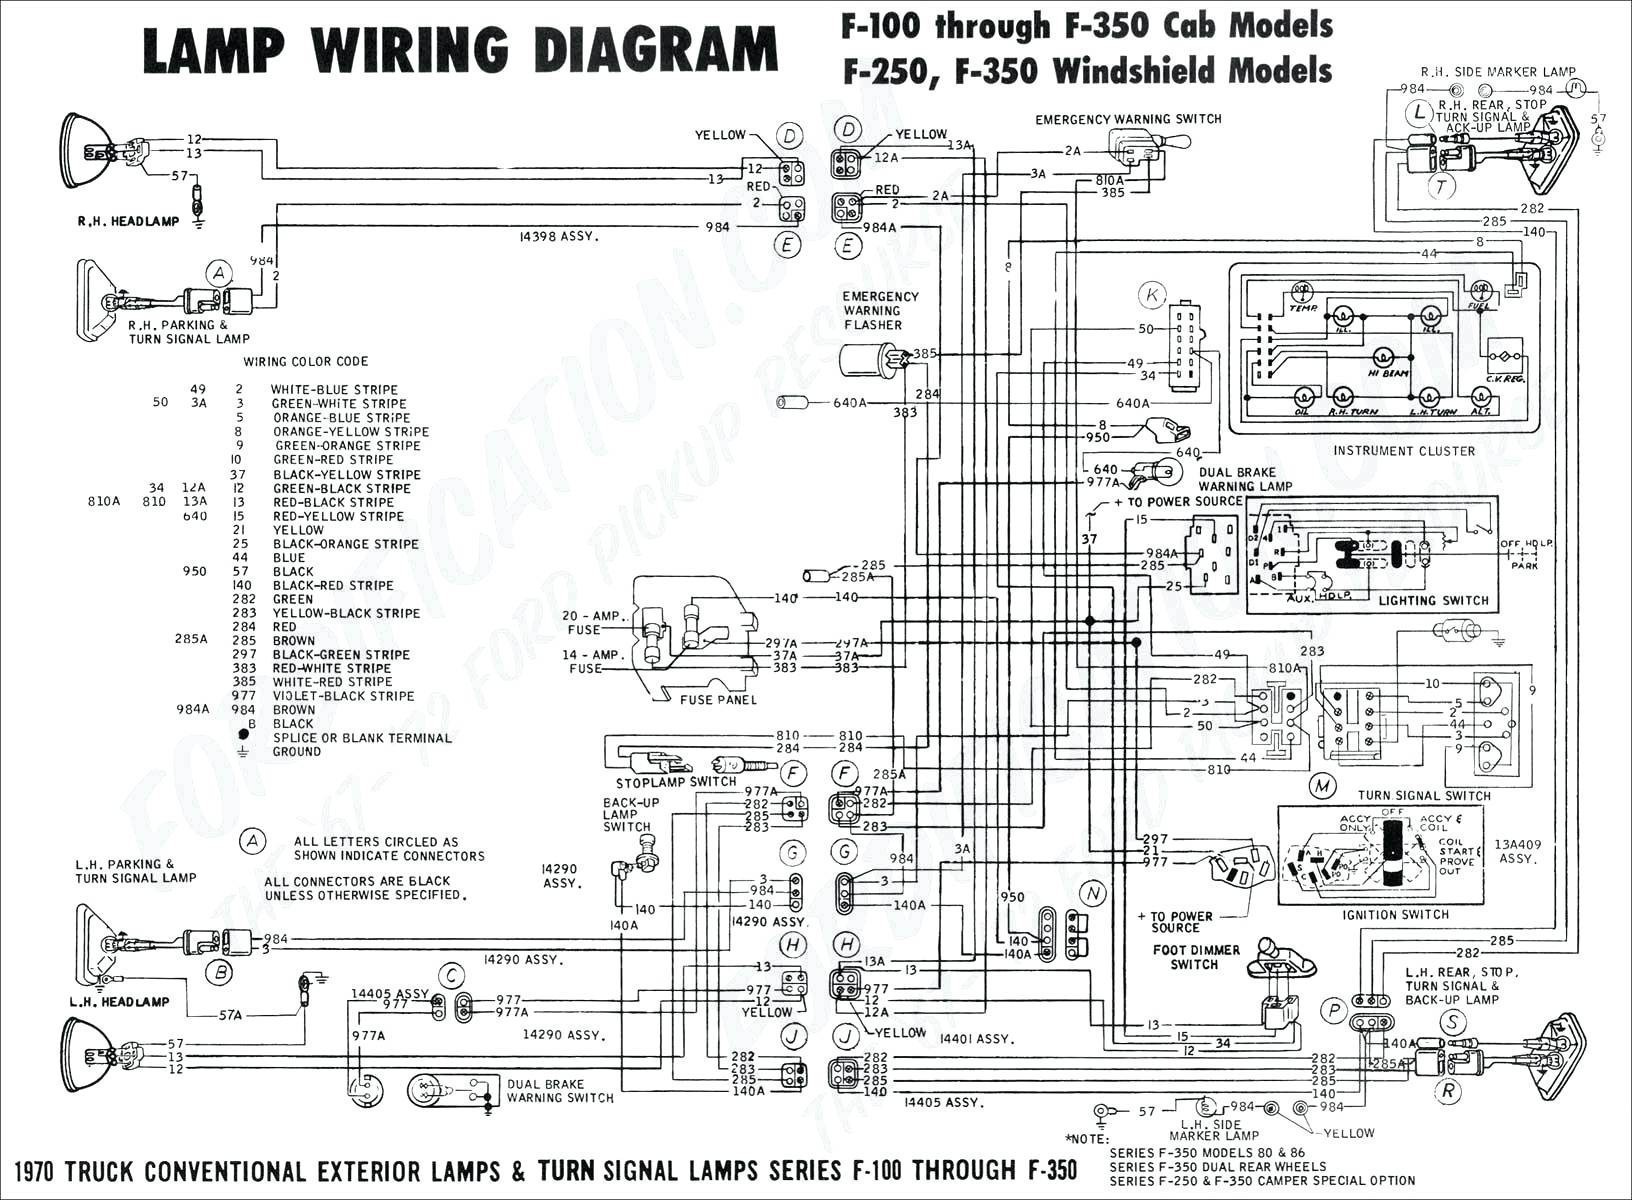 hight resolution of 2008 dodge ram 1500 trailer wiring diagram new 2008 dodge ram 1500 trailer brake wiring diagram